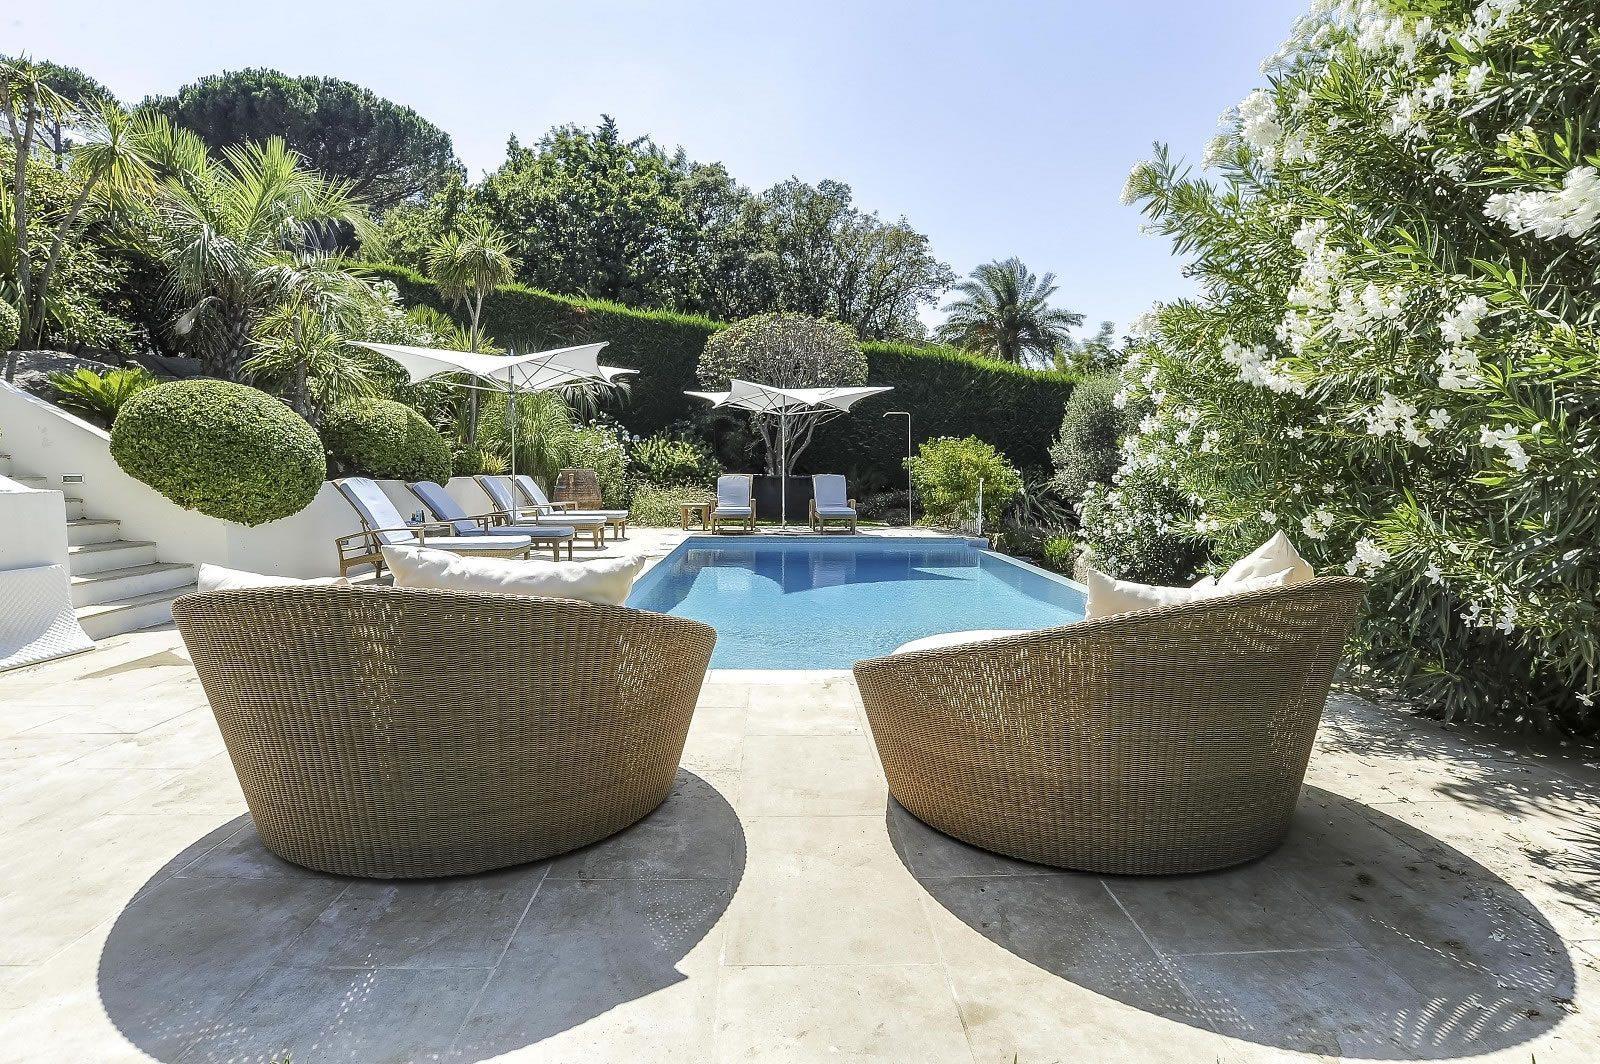 belle-propriete-piscine-a-vendre-gassin-cheminee-belle-terrasse-cave-vin